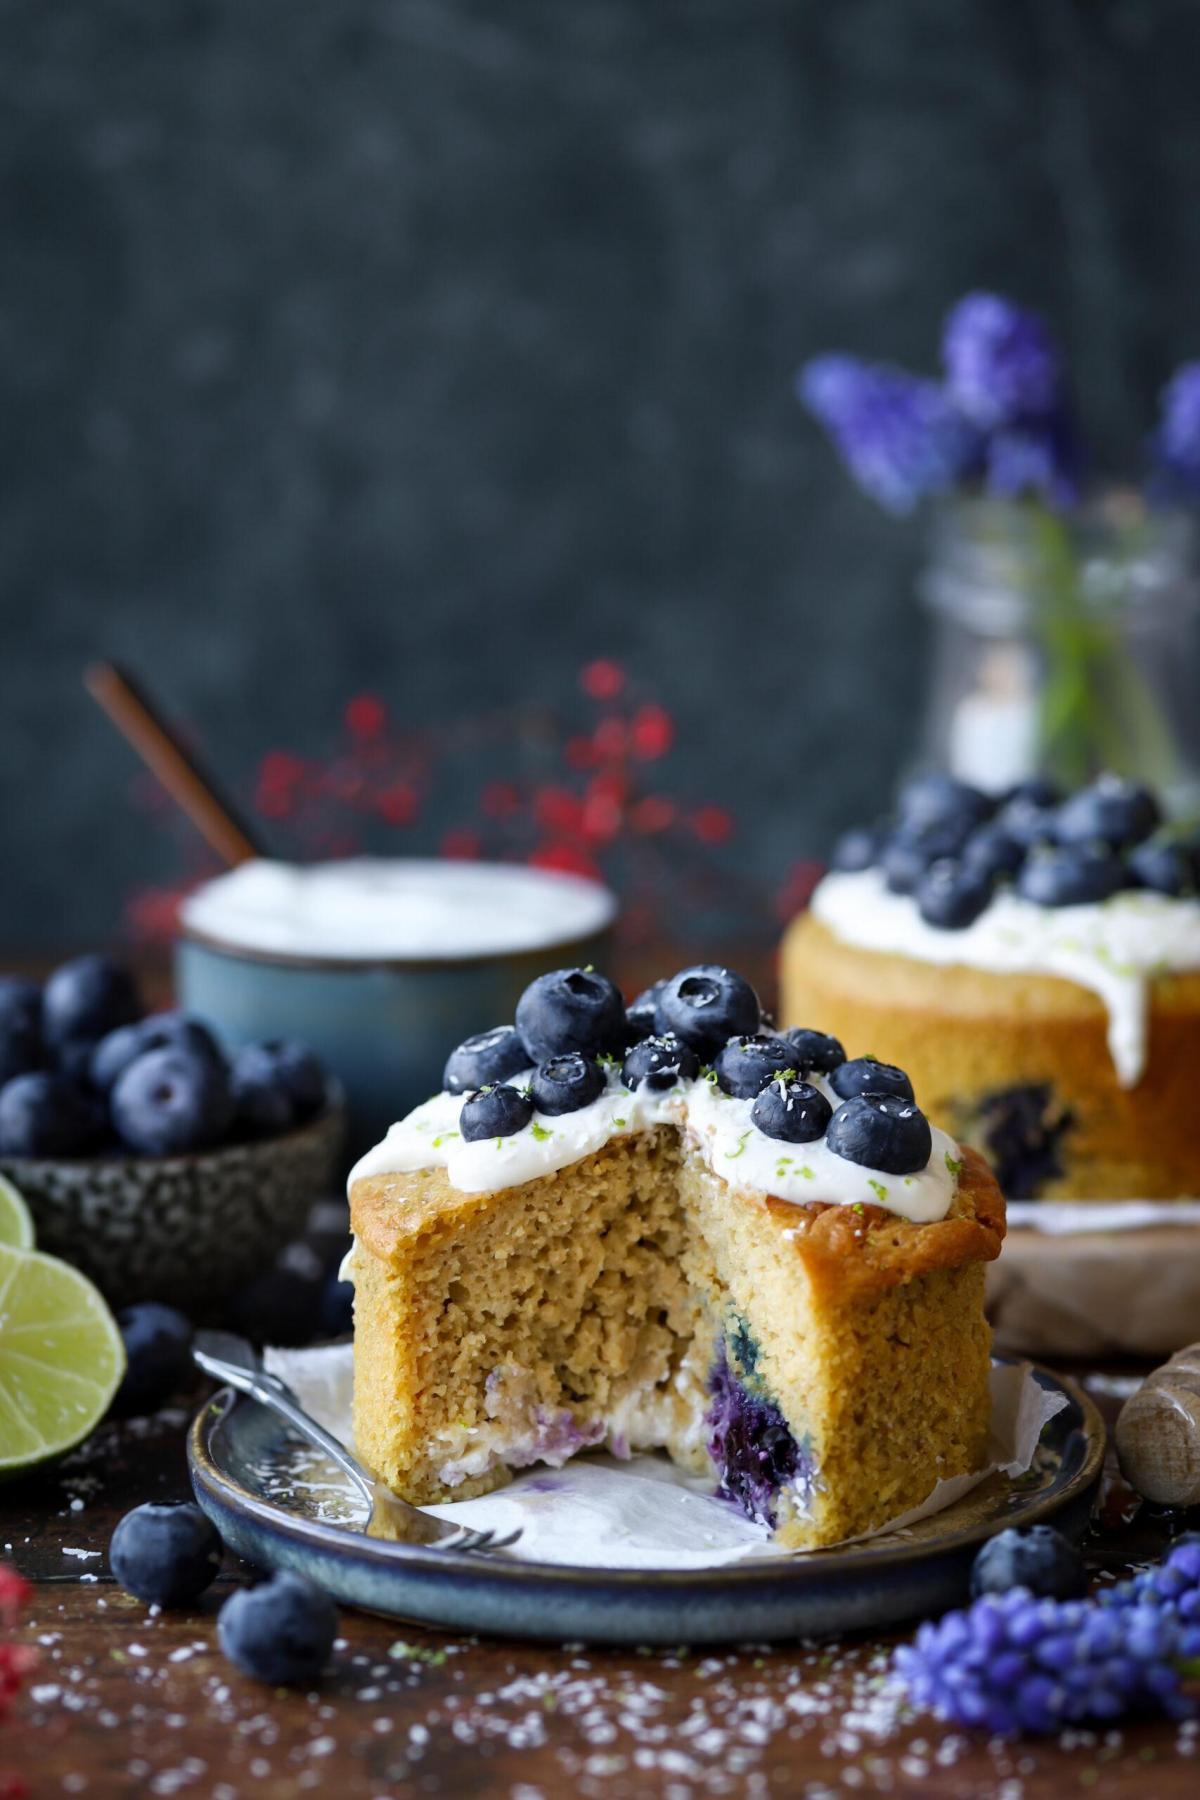 Blueberry cheesecake ontbijttaartje, glutenvrij én vegan!